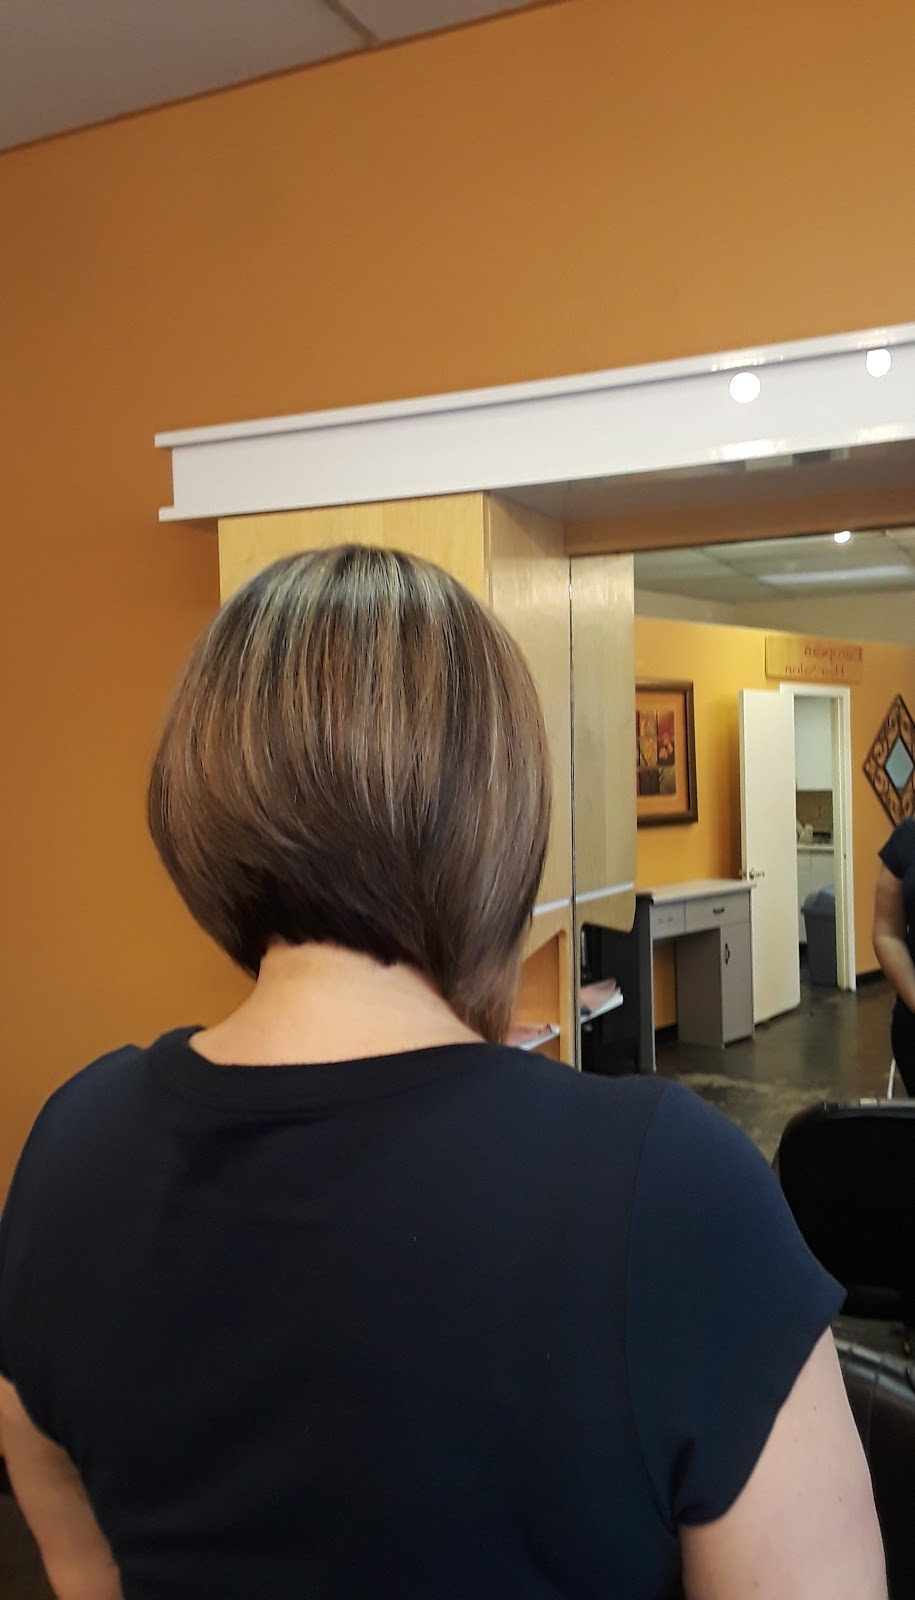 European hair salon - hair care    Photo 3 of 3   Address: 330 NE Chkalov Dr, Vancouver, WA 98684, USA   Phone: (360) 892-4904